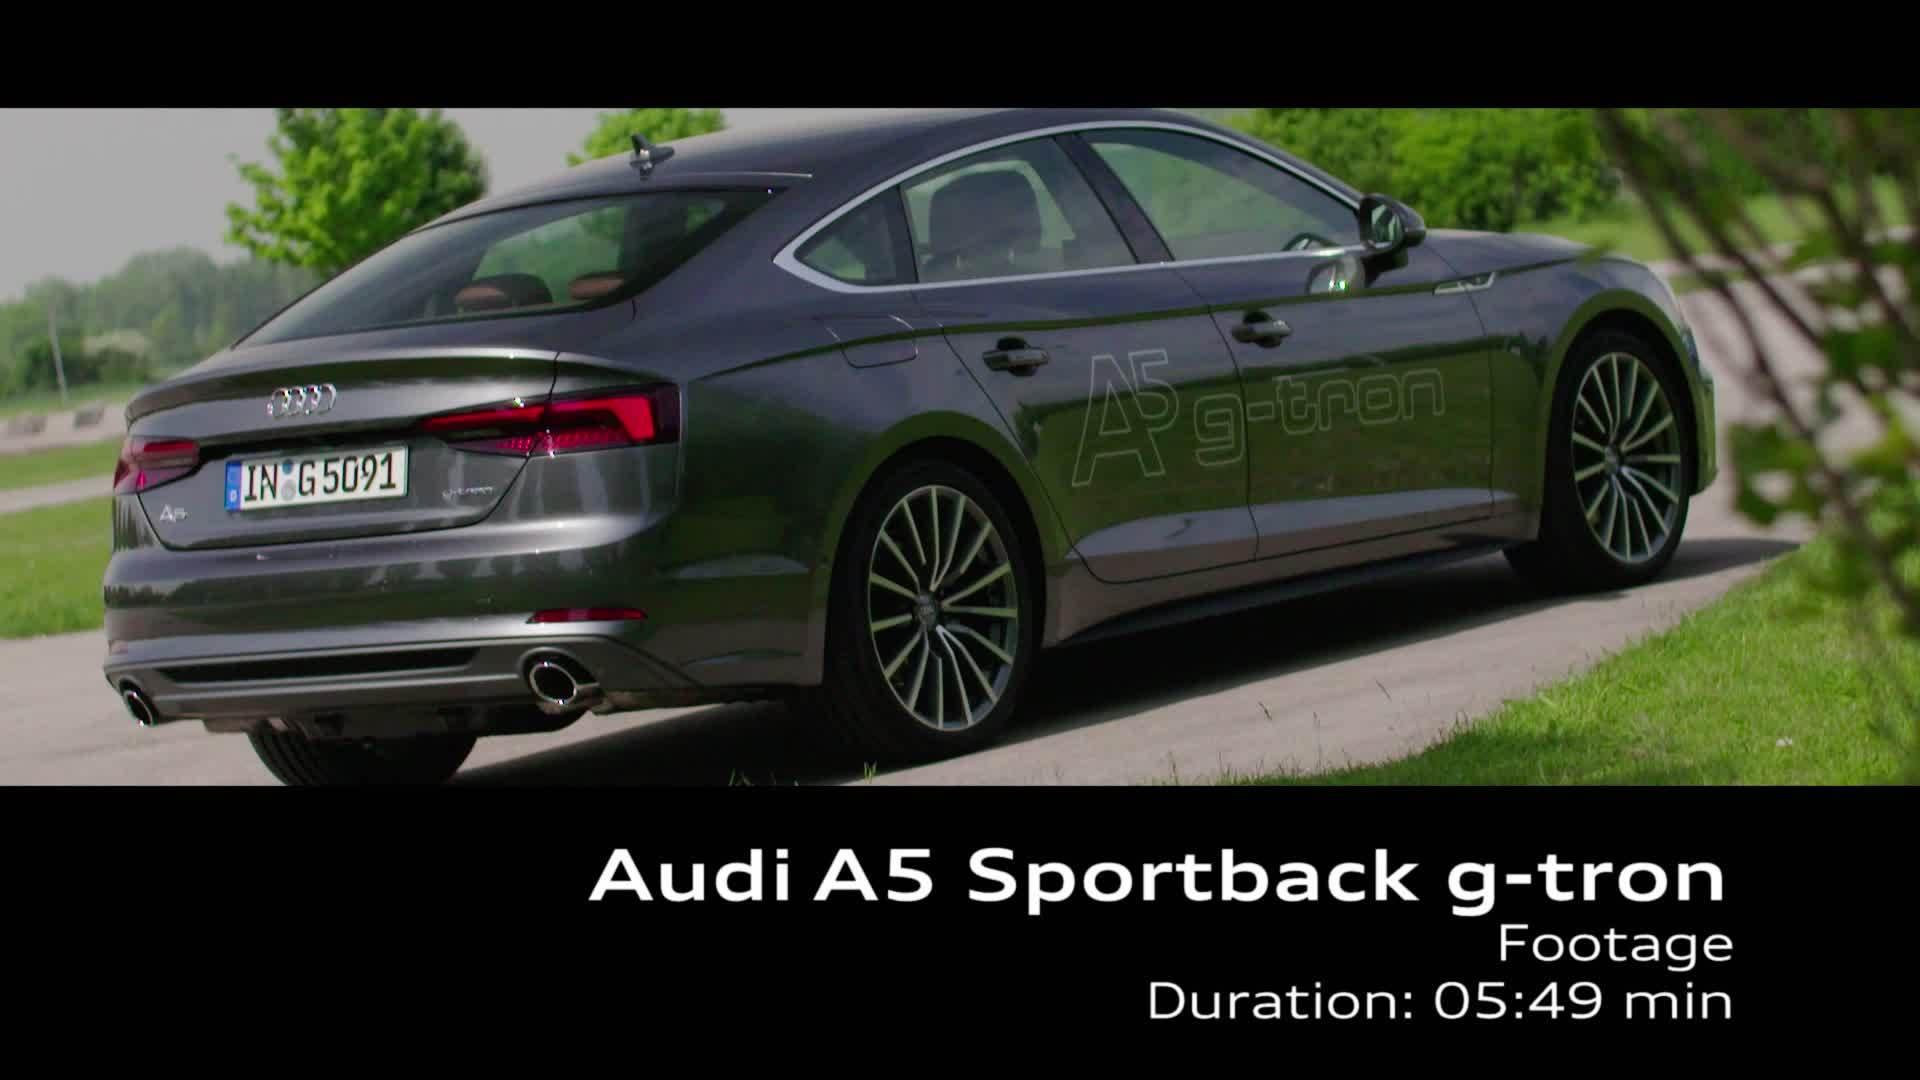 Audi A5 Sportback g-tron - Footage TechDay